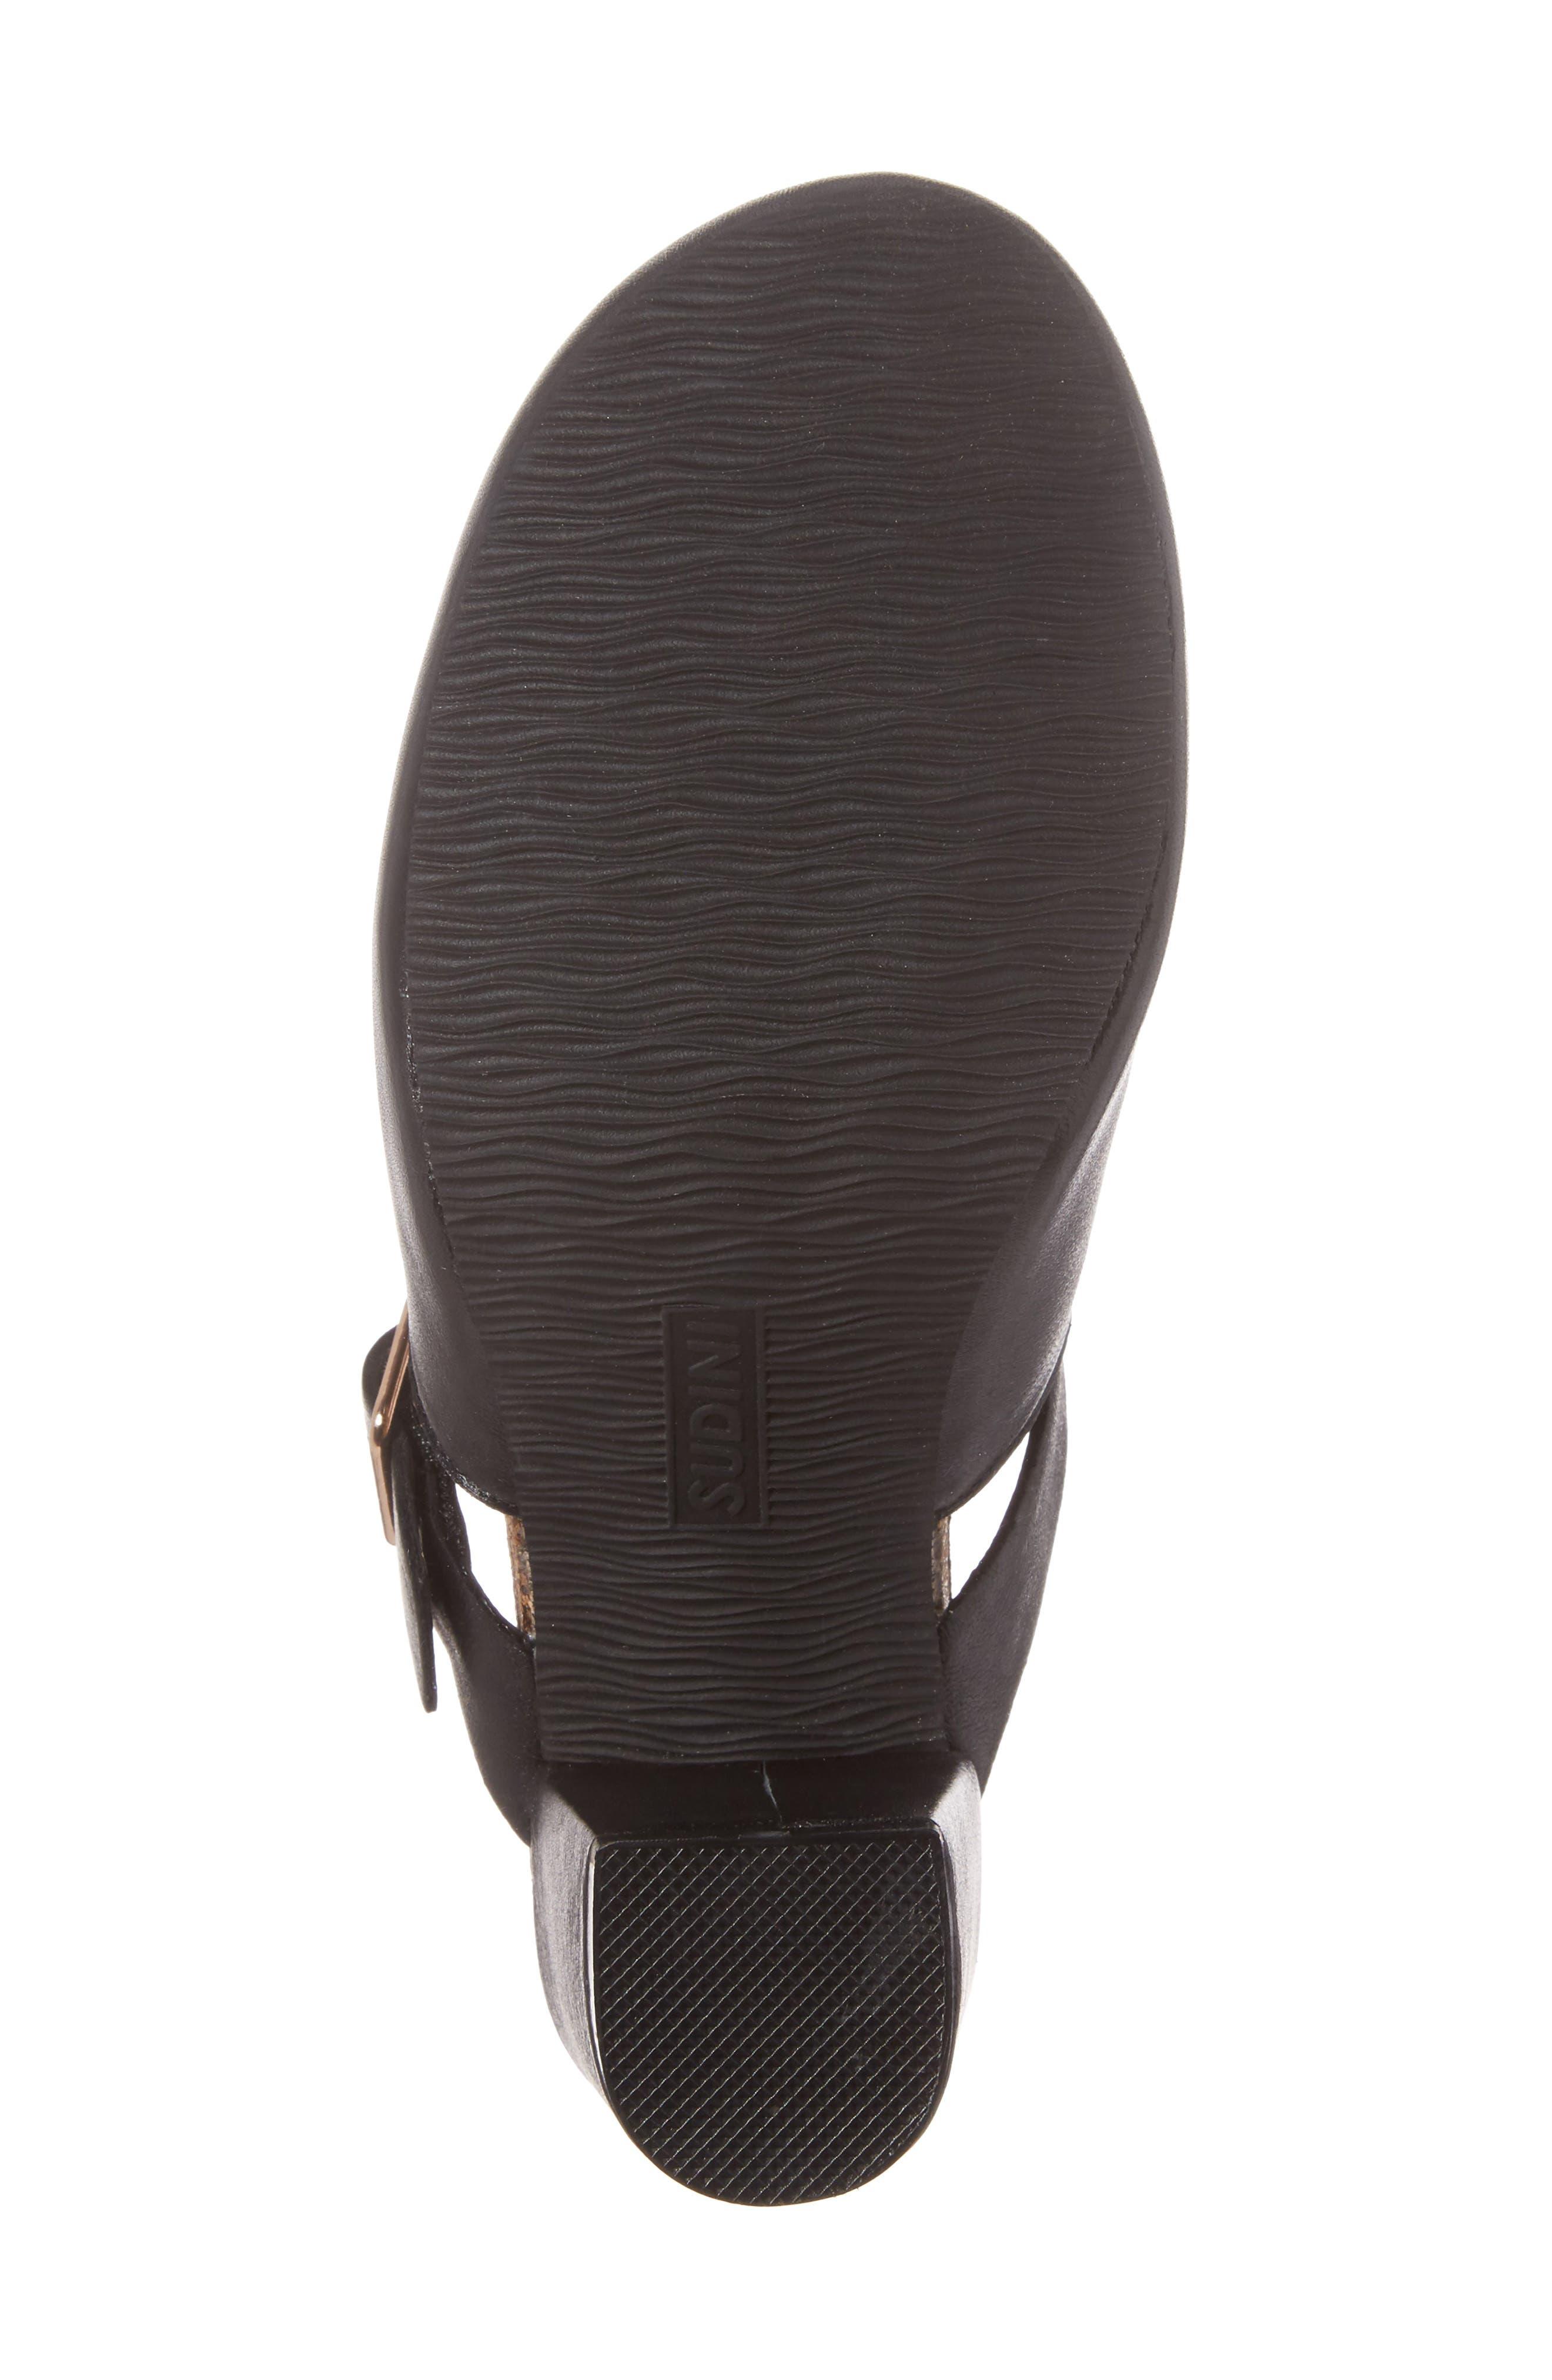 Cindy Block Heel Mule,                             Alternate thumbnail 6, color,                             Black Leather